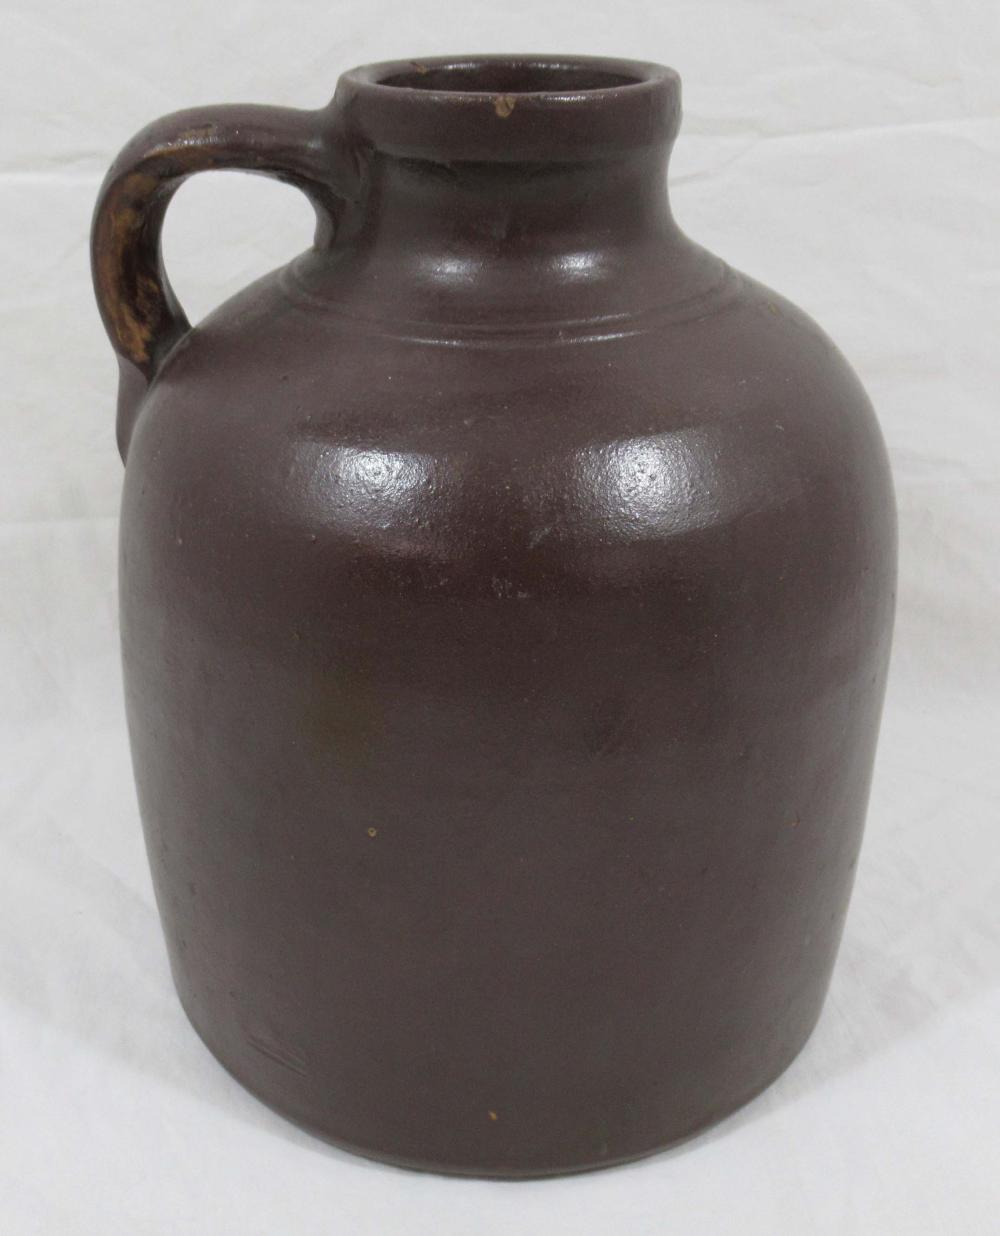 Evans Pottery Lg. Mouth Jug